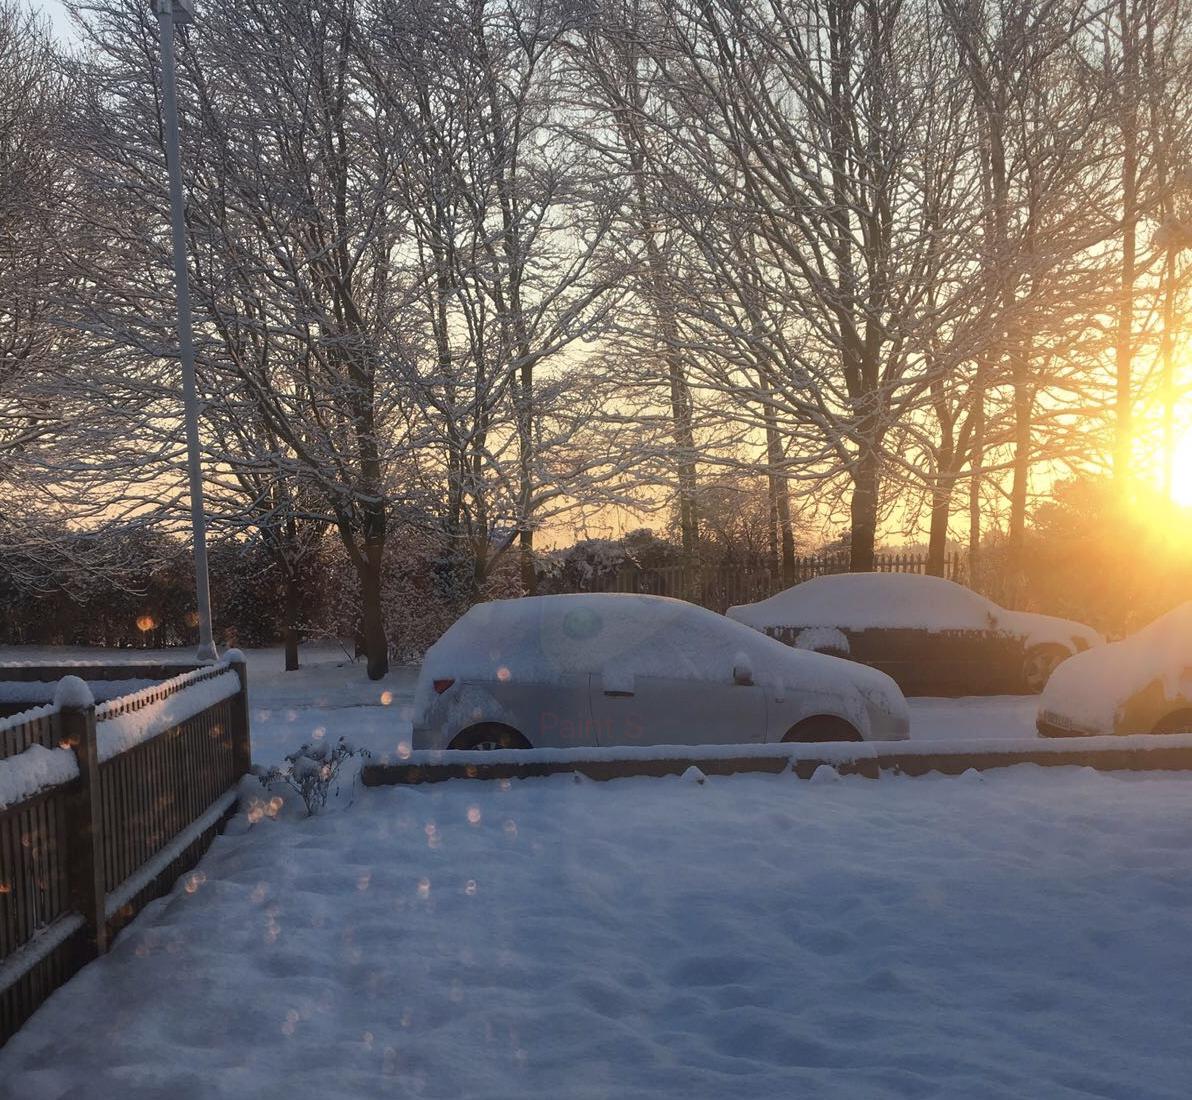 February snow 2018